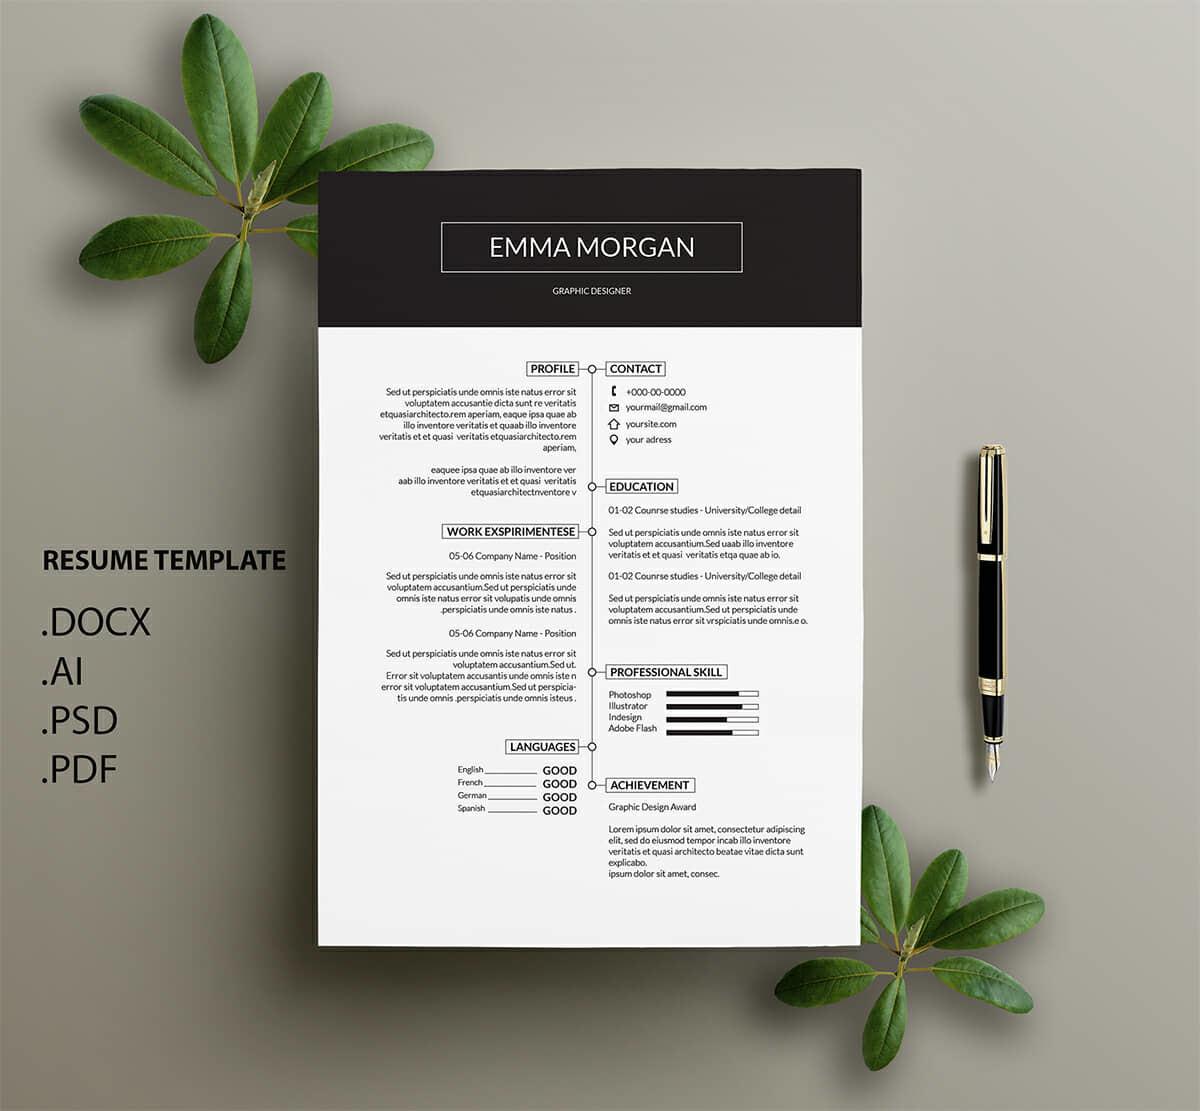 Download minimalist resume template word graphic templates by richard_2010. 15 Clean Minimalist Resume Templates Sleek Design